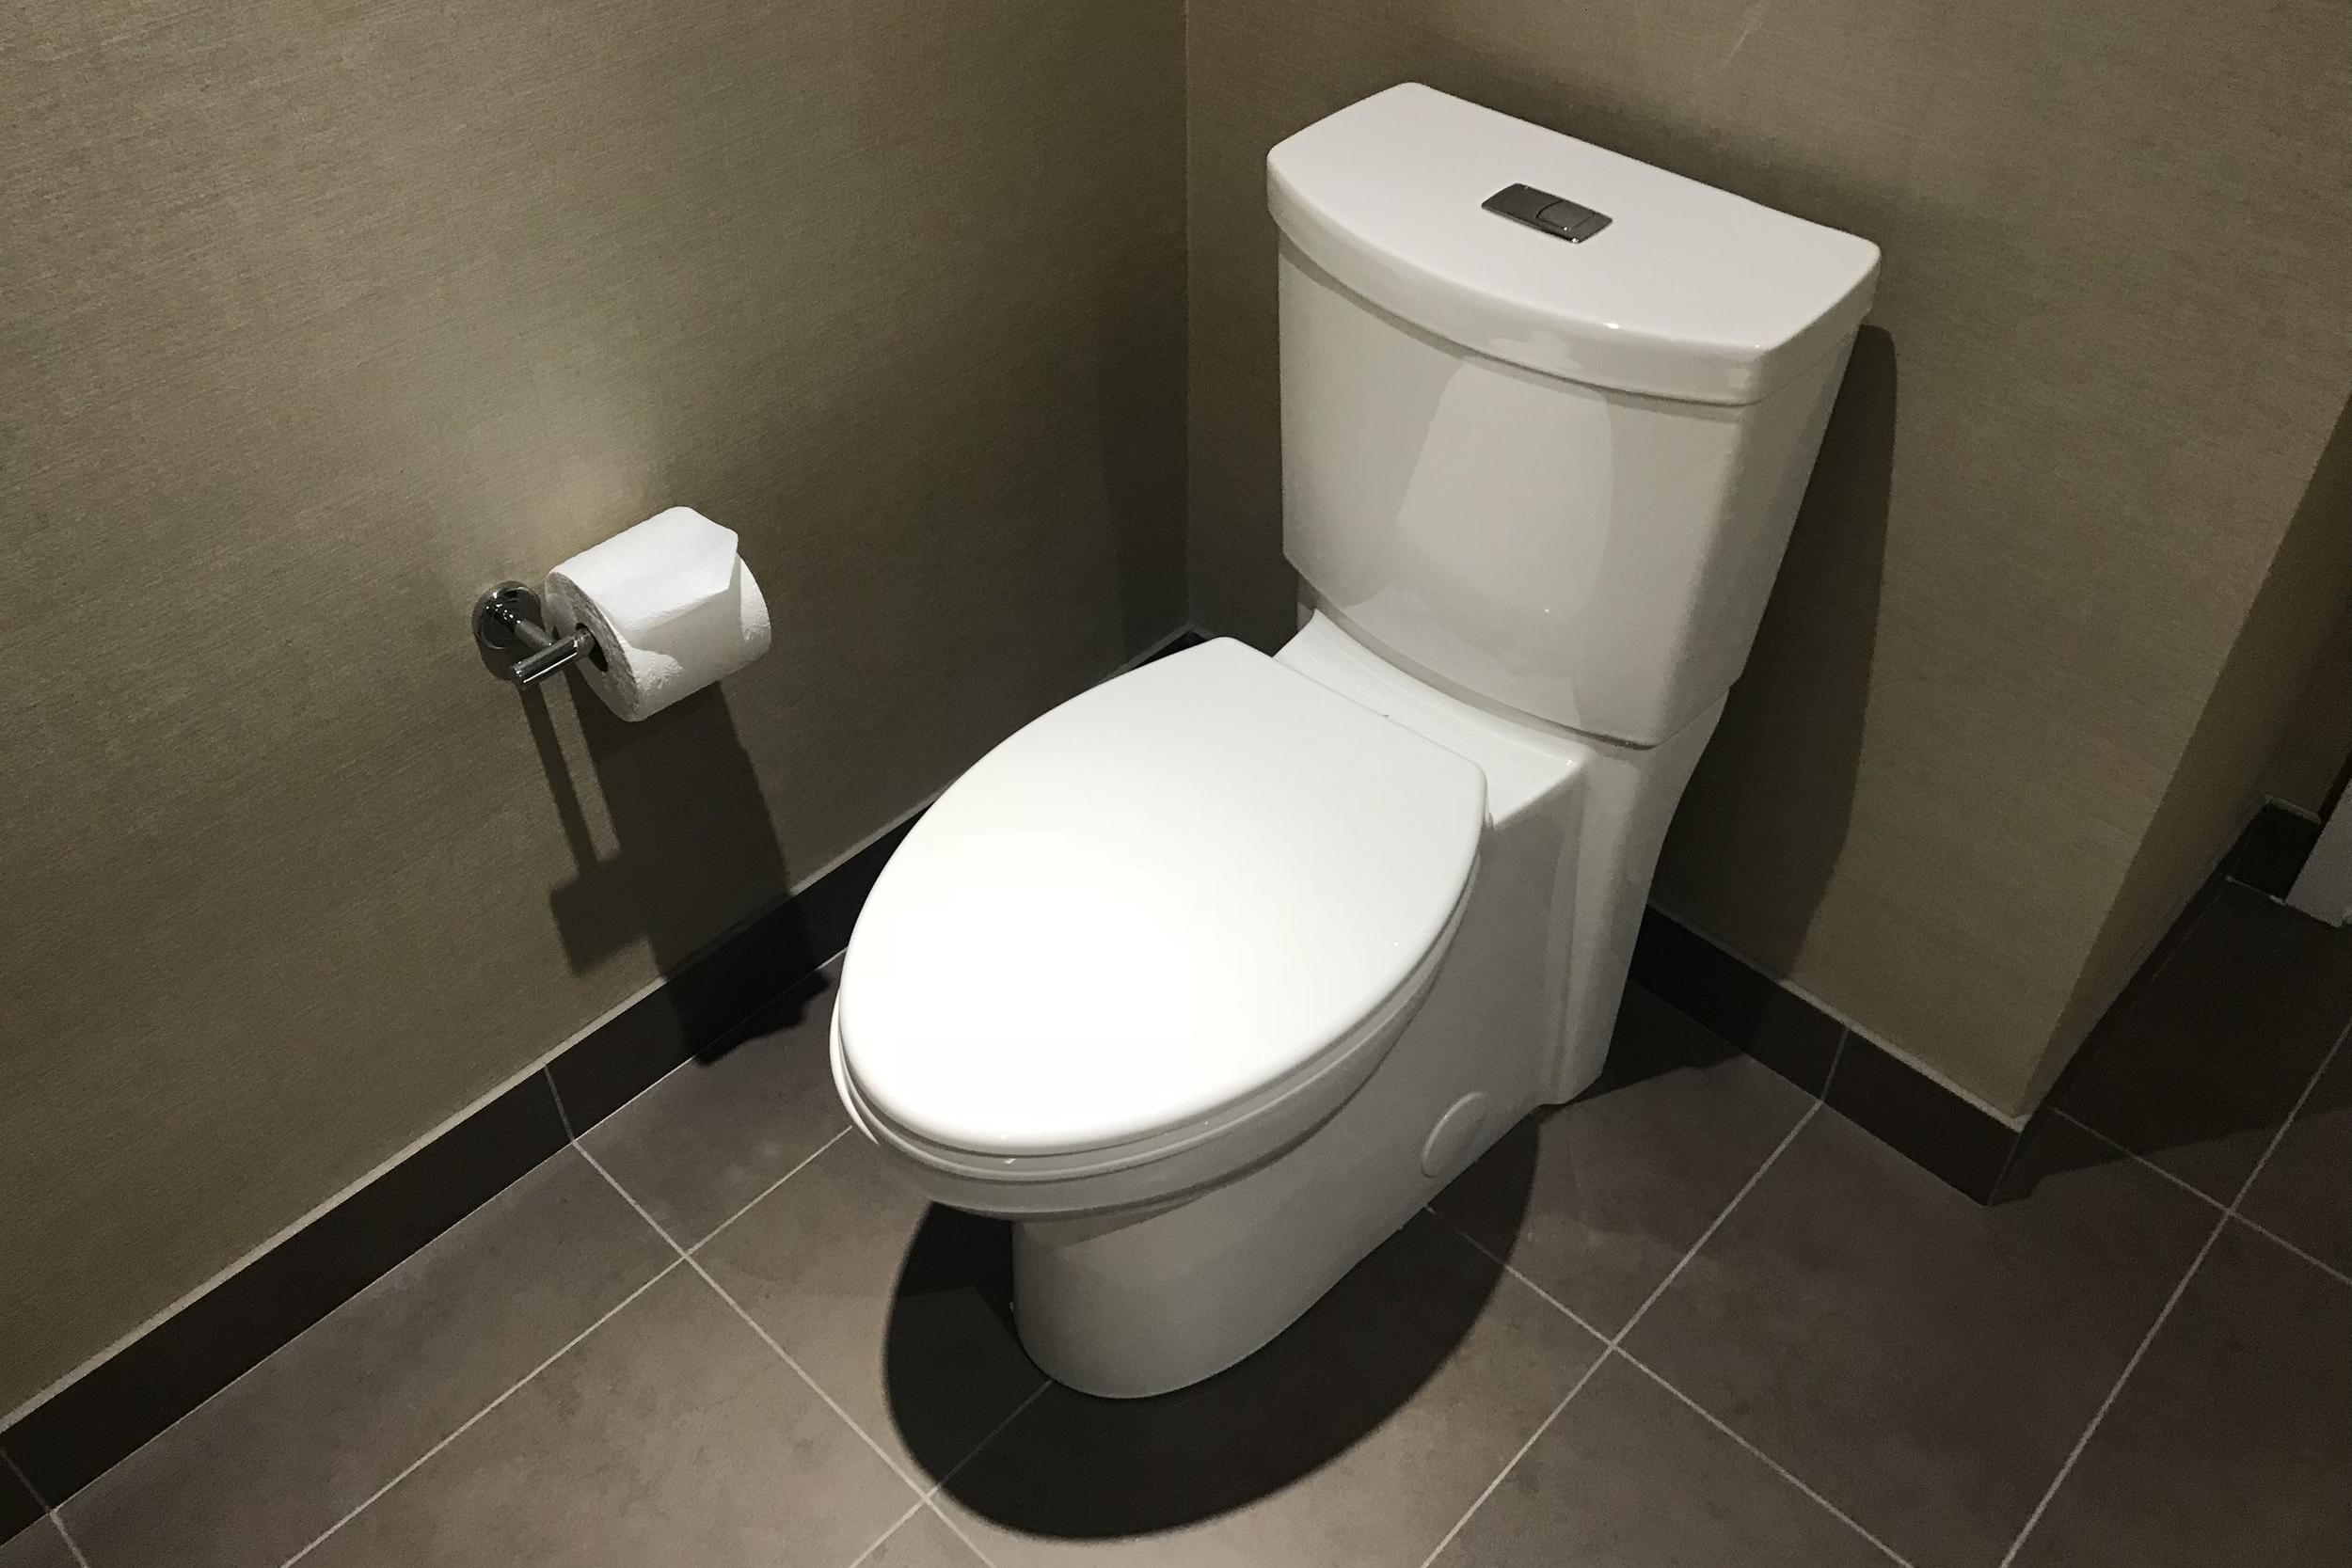 Marriott In-Terminal Hotel Calgary Airport – Toilet